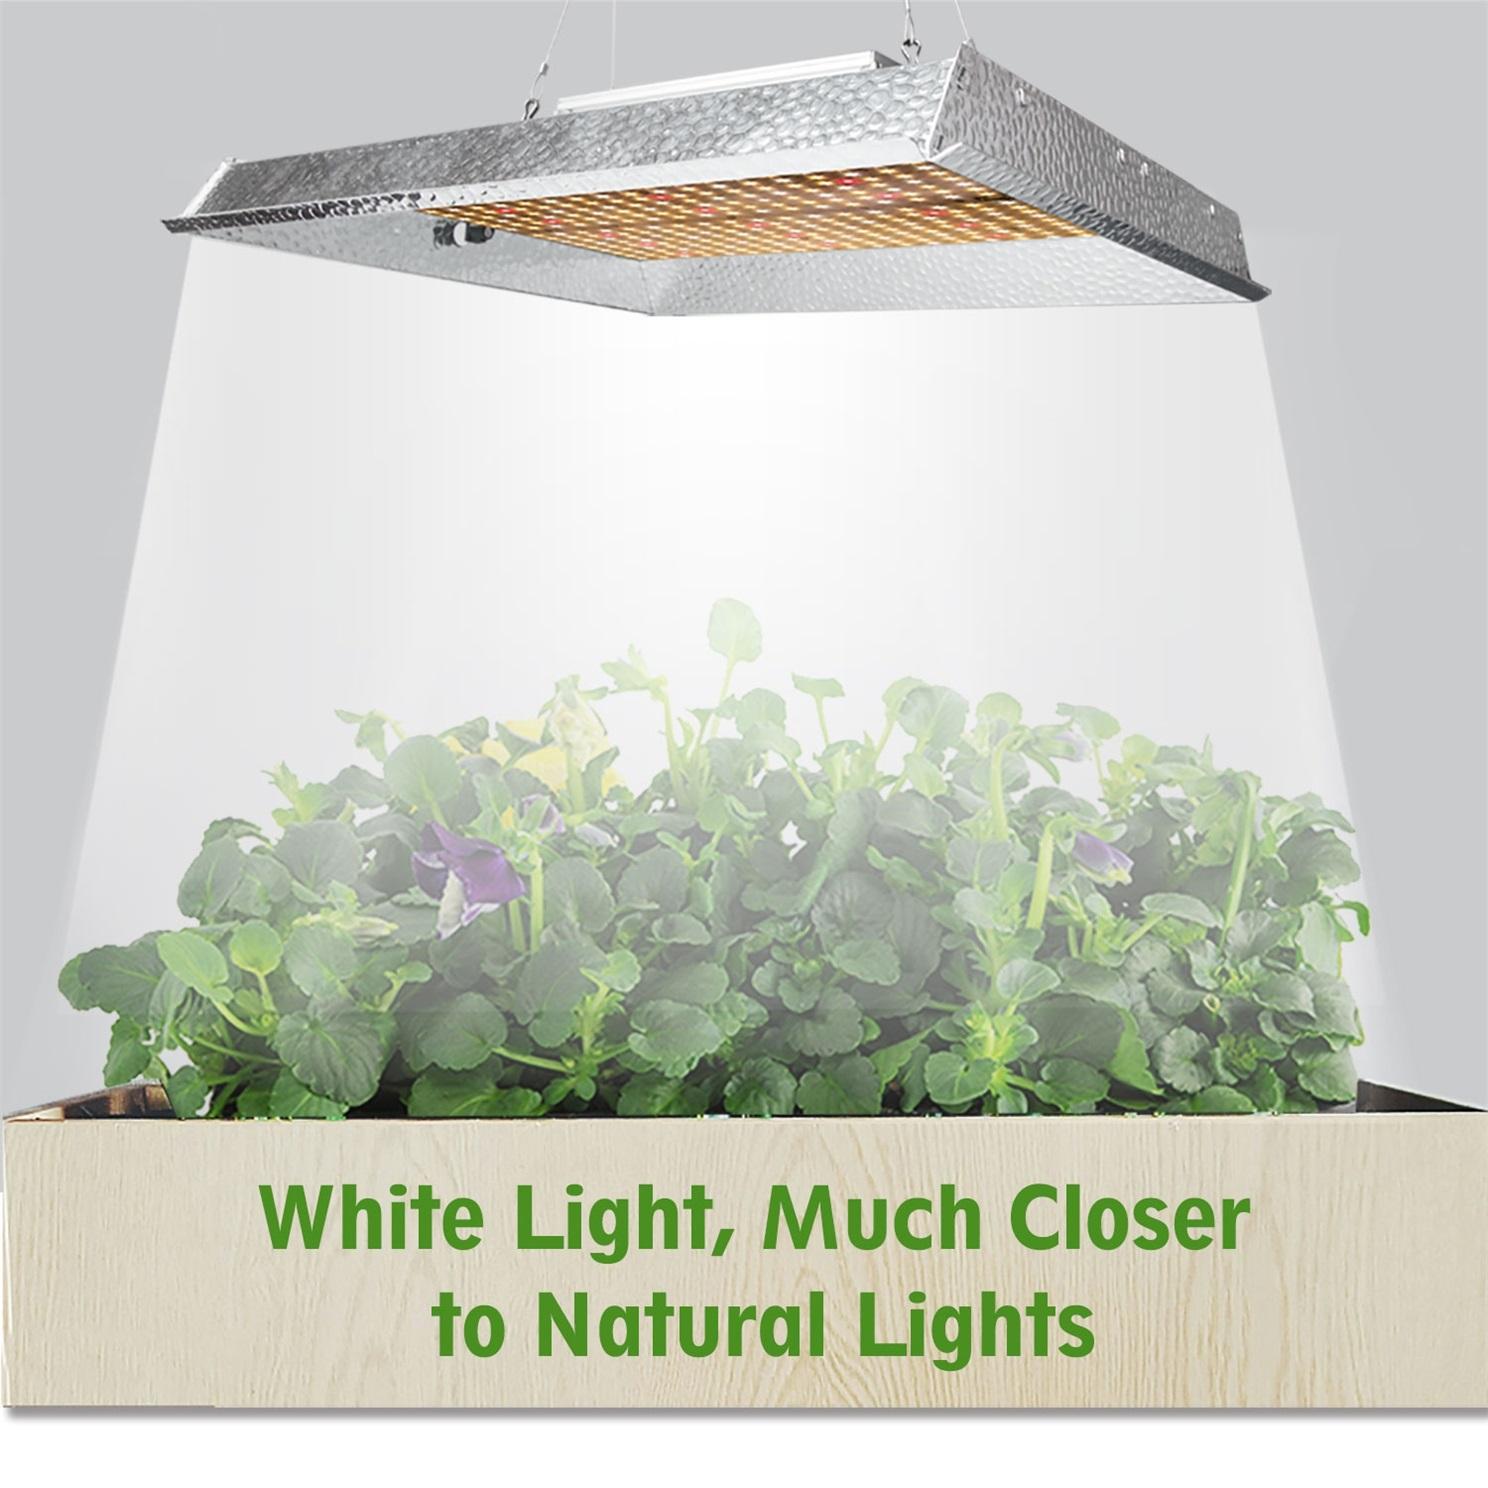 Mars Hydro Ts 1000w 2000w Led Grow Light Indoor Plants Veg